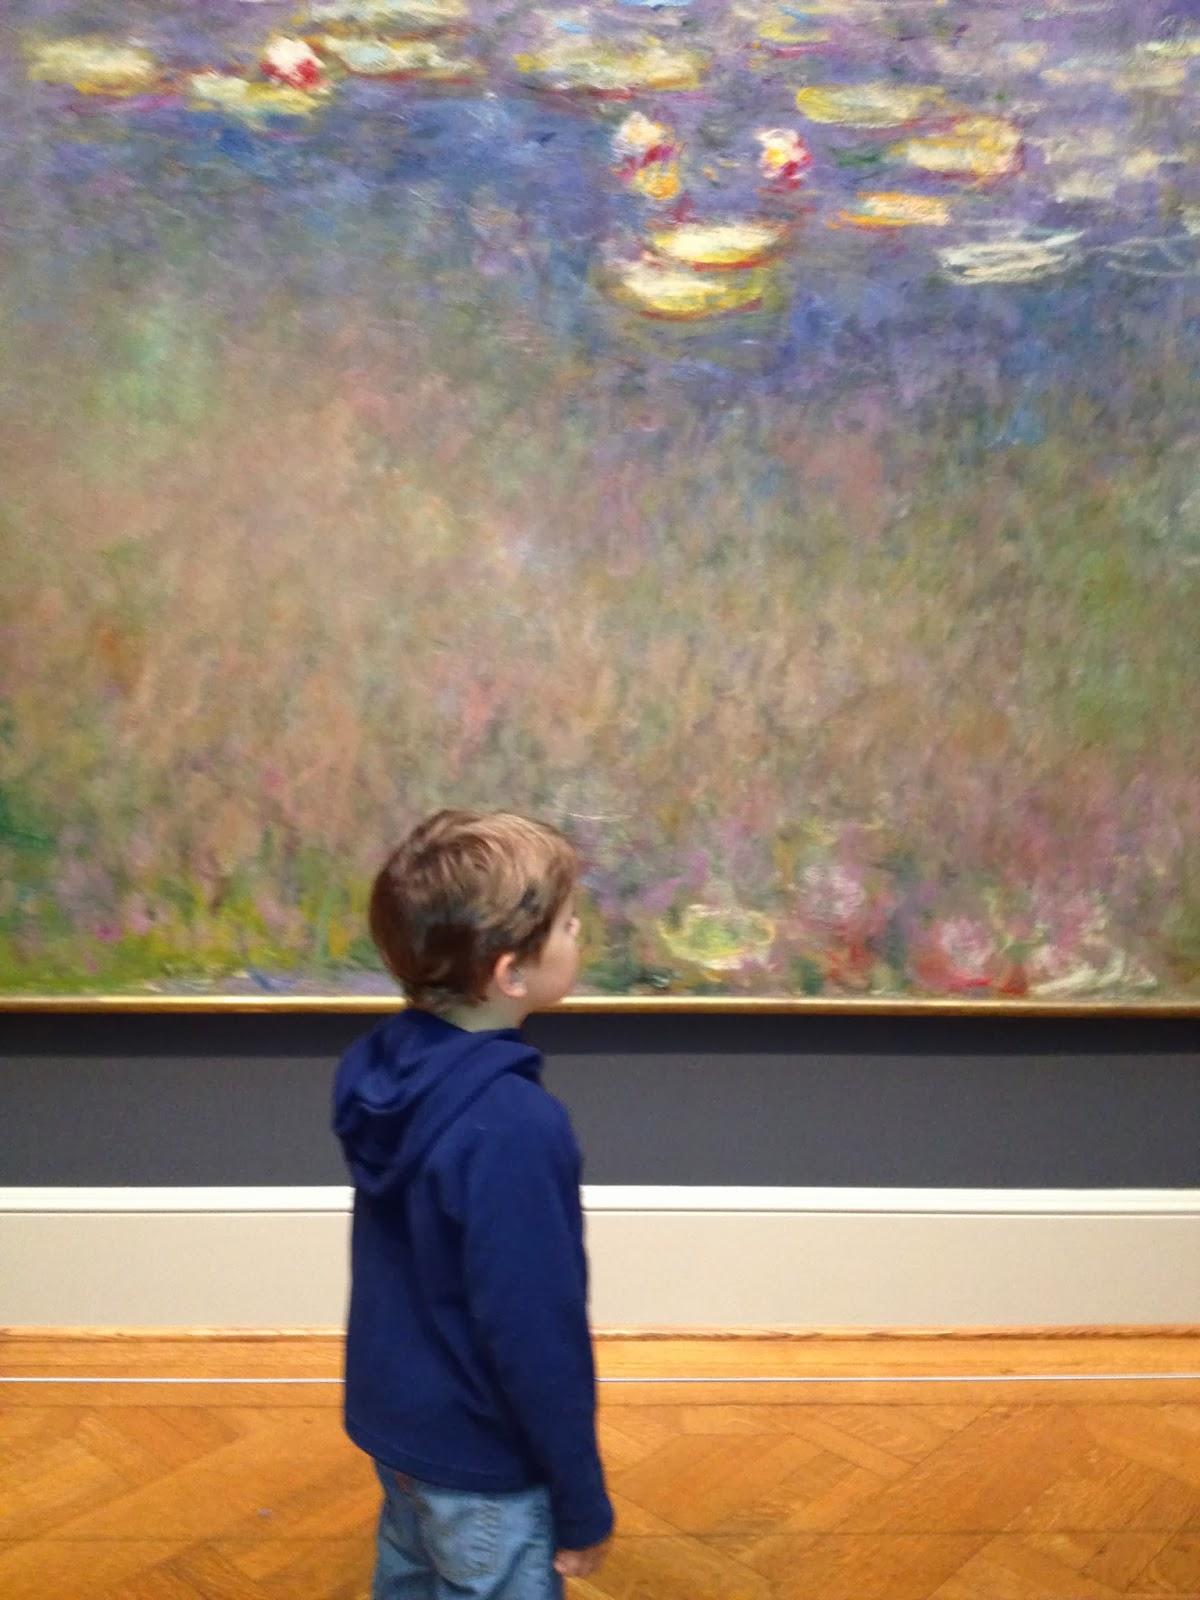 St. Louis Art Museum for Kids